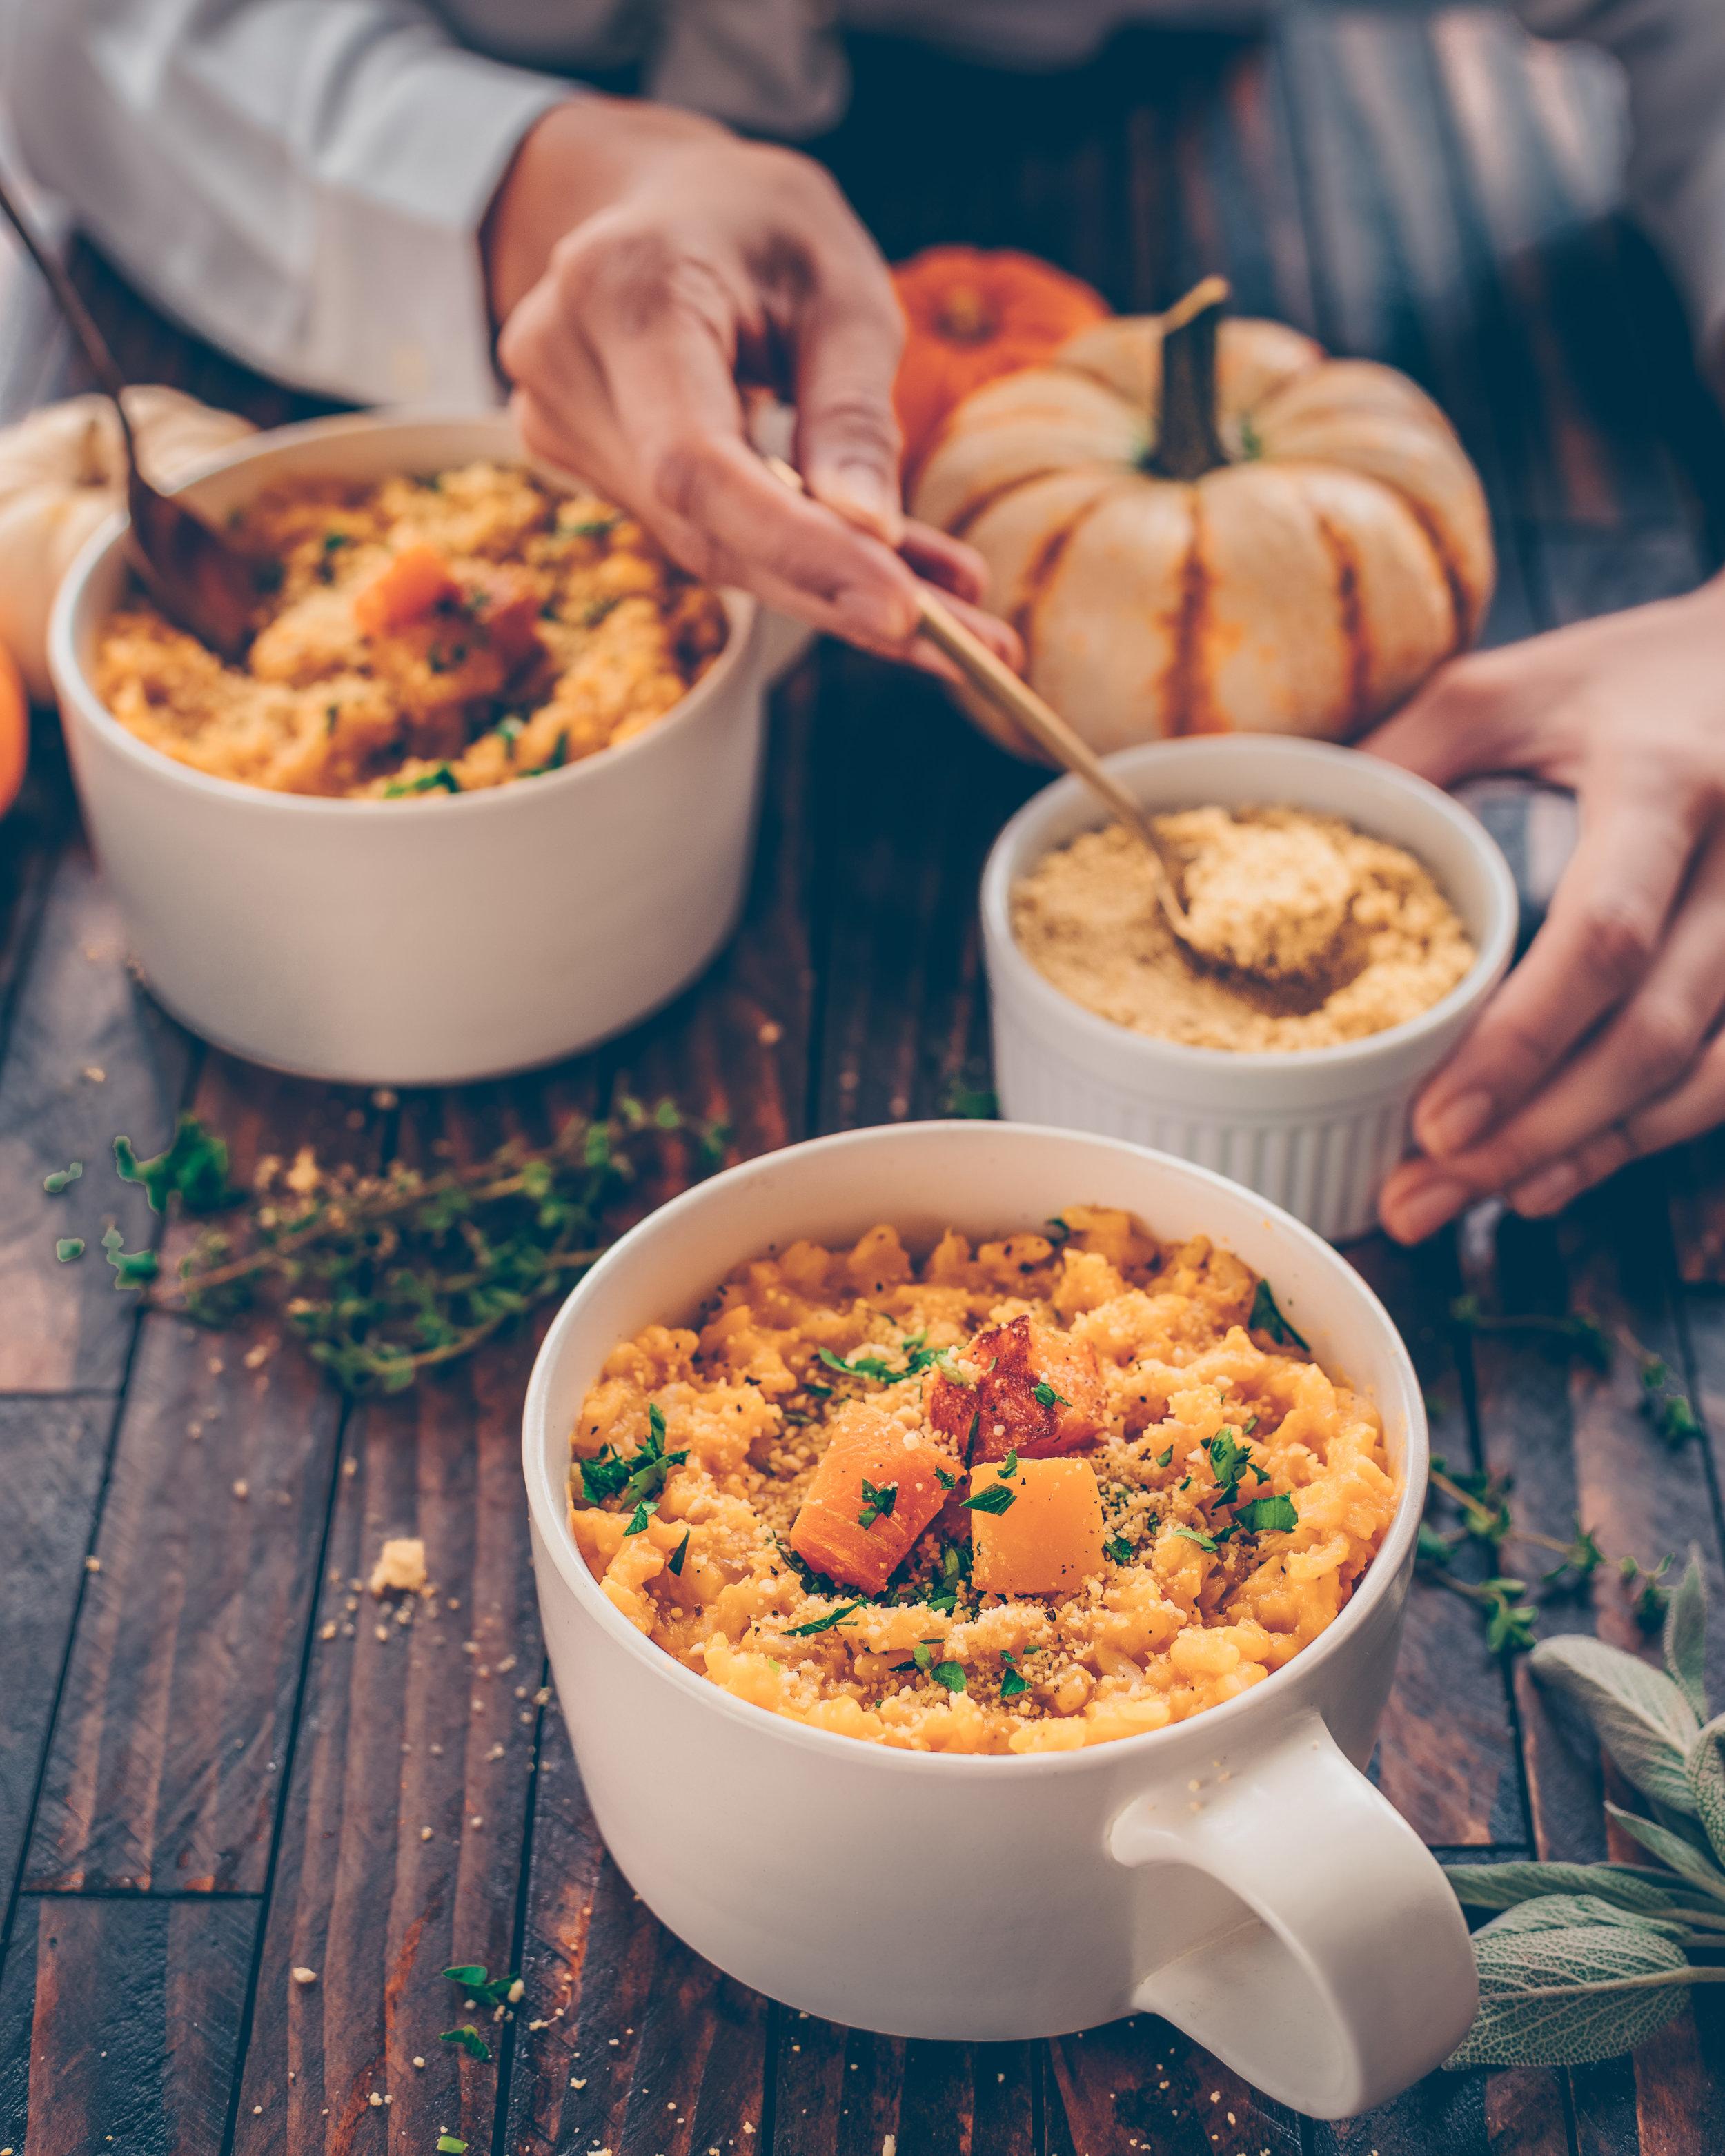 Cashew Parmesan Crumble - V, GF, P